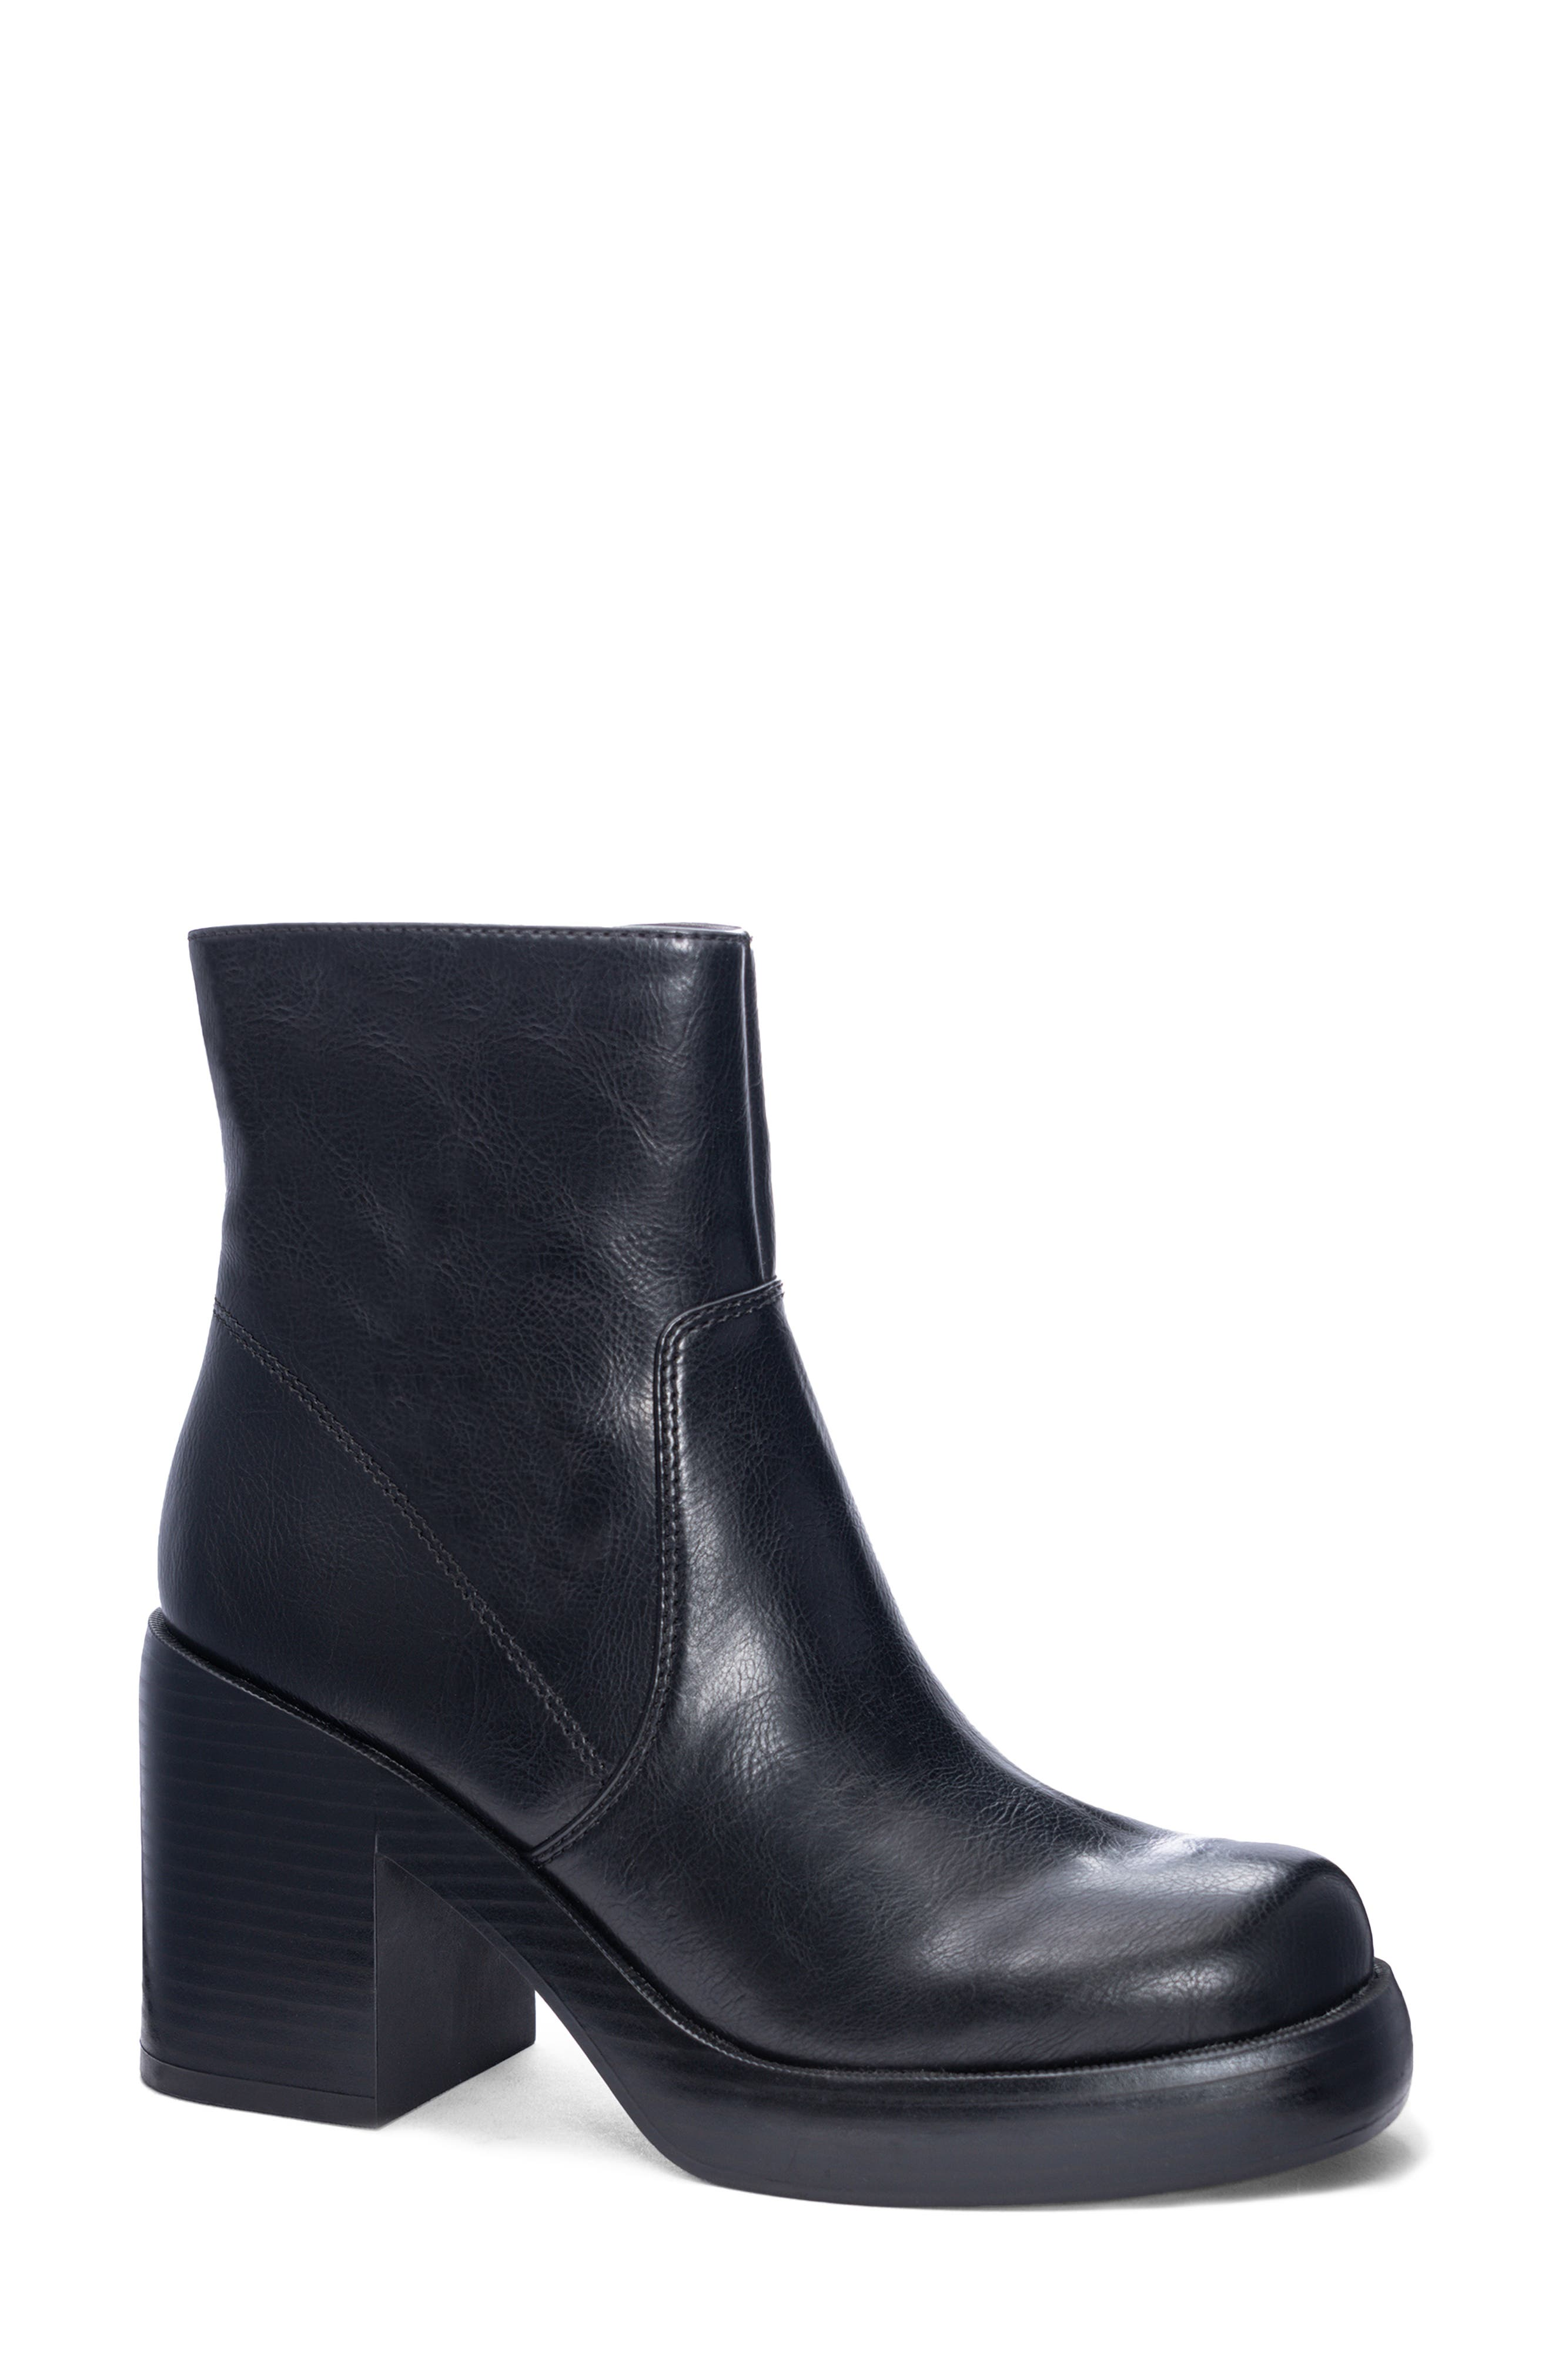 Groovy Platform Boot